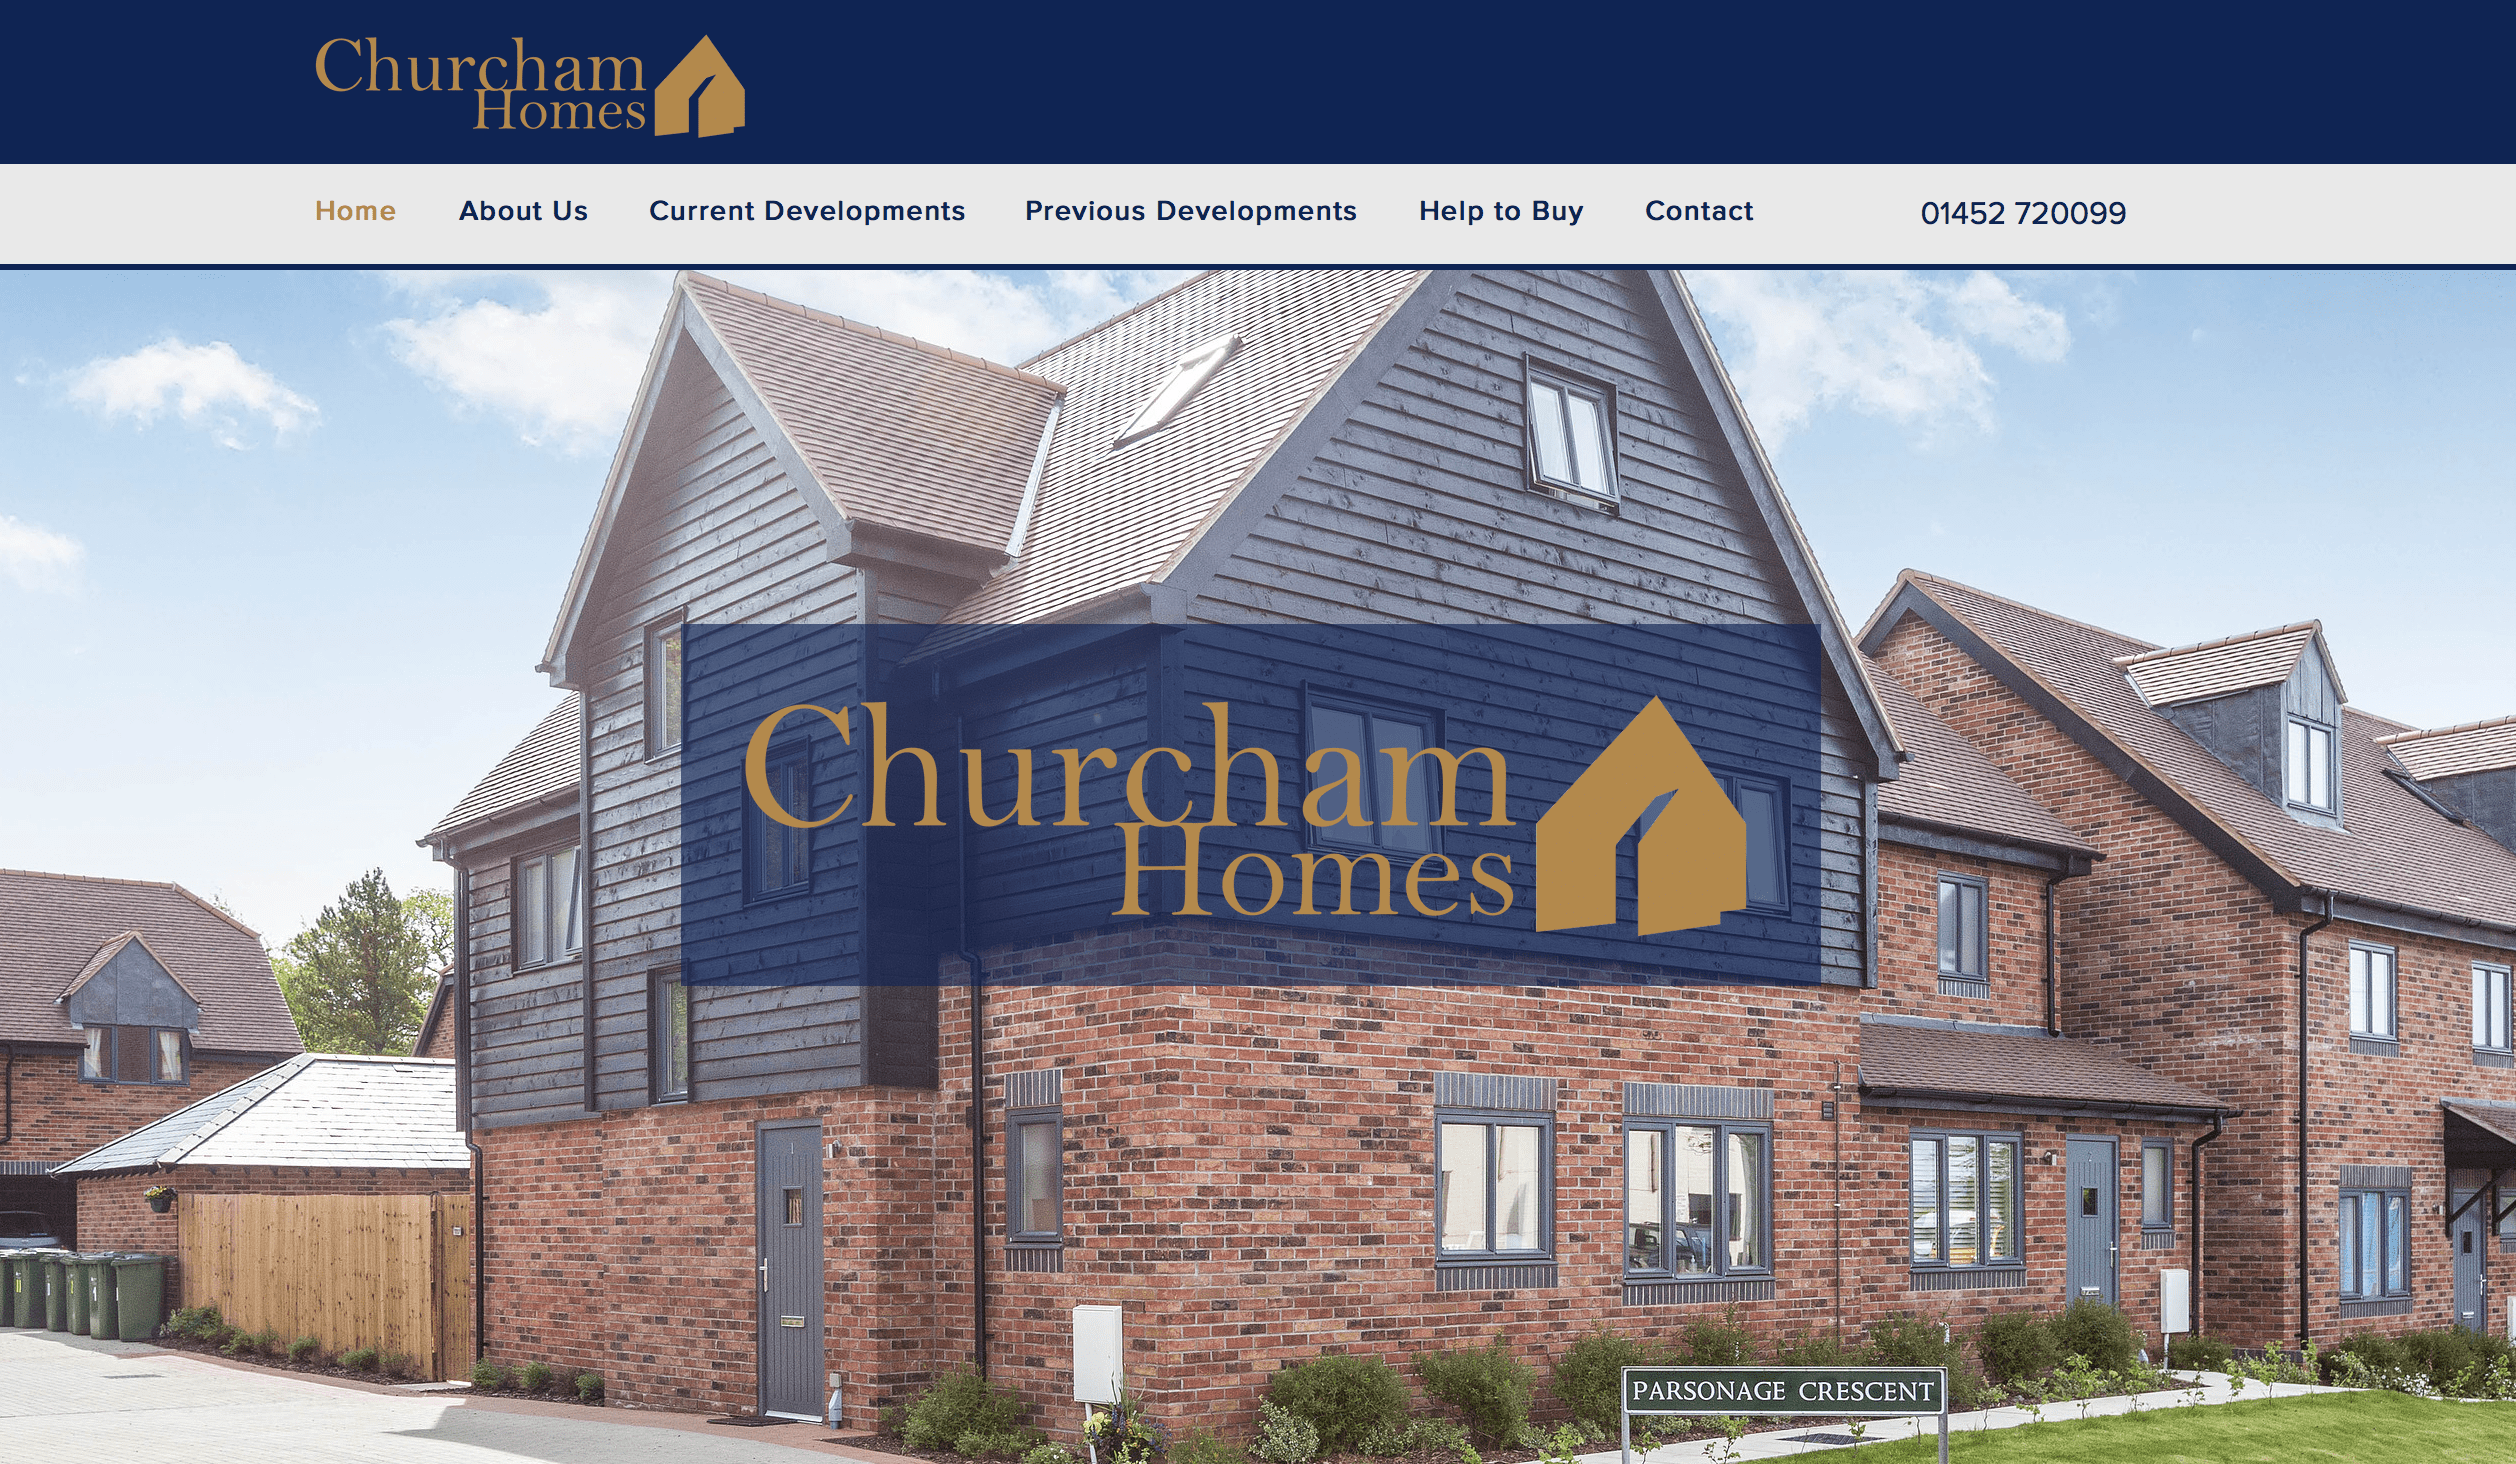 Churcham Homes